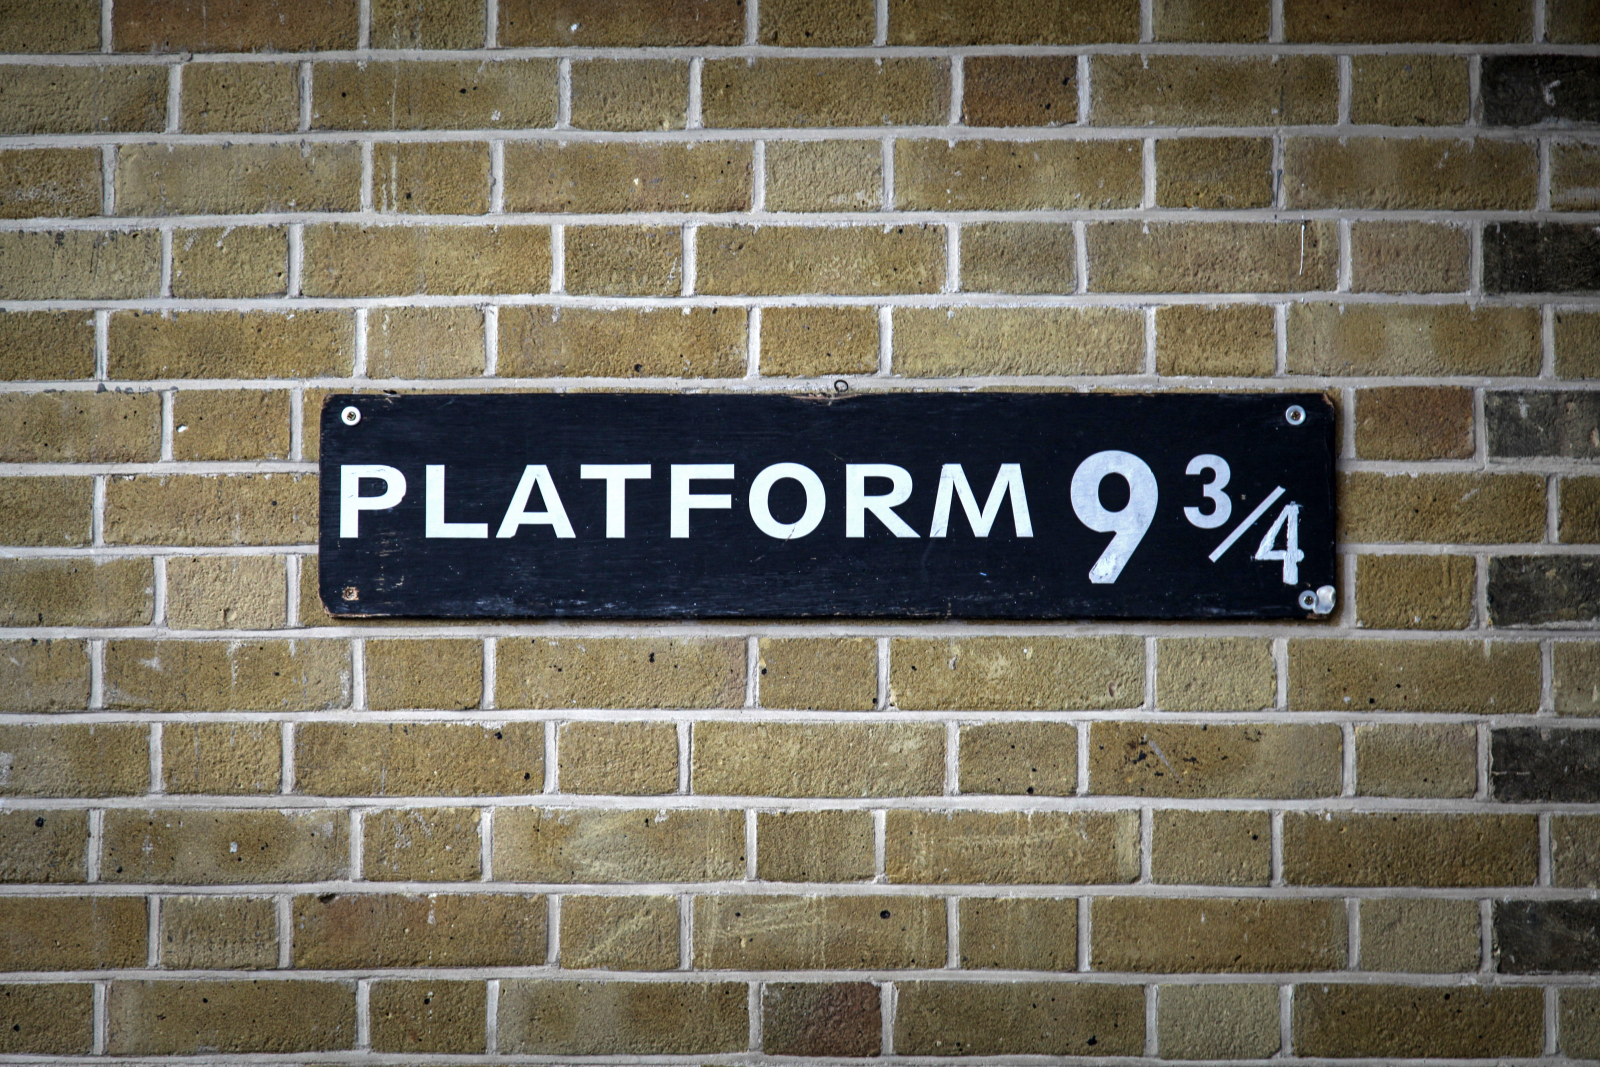 Gleis 9 3/4 am Bahnhof Kings Cross